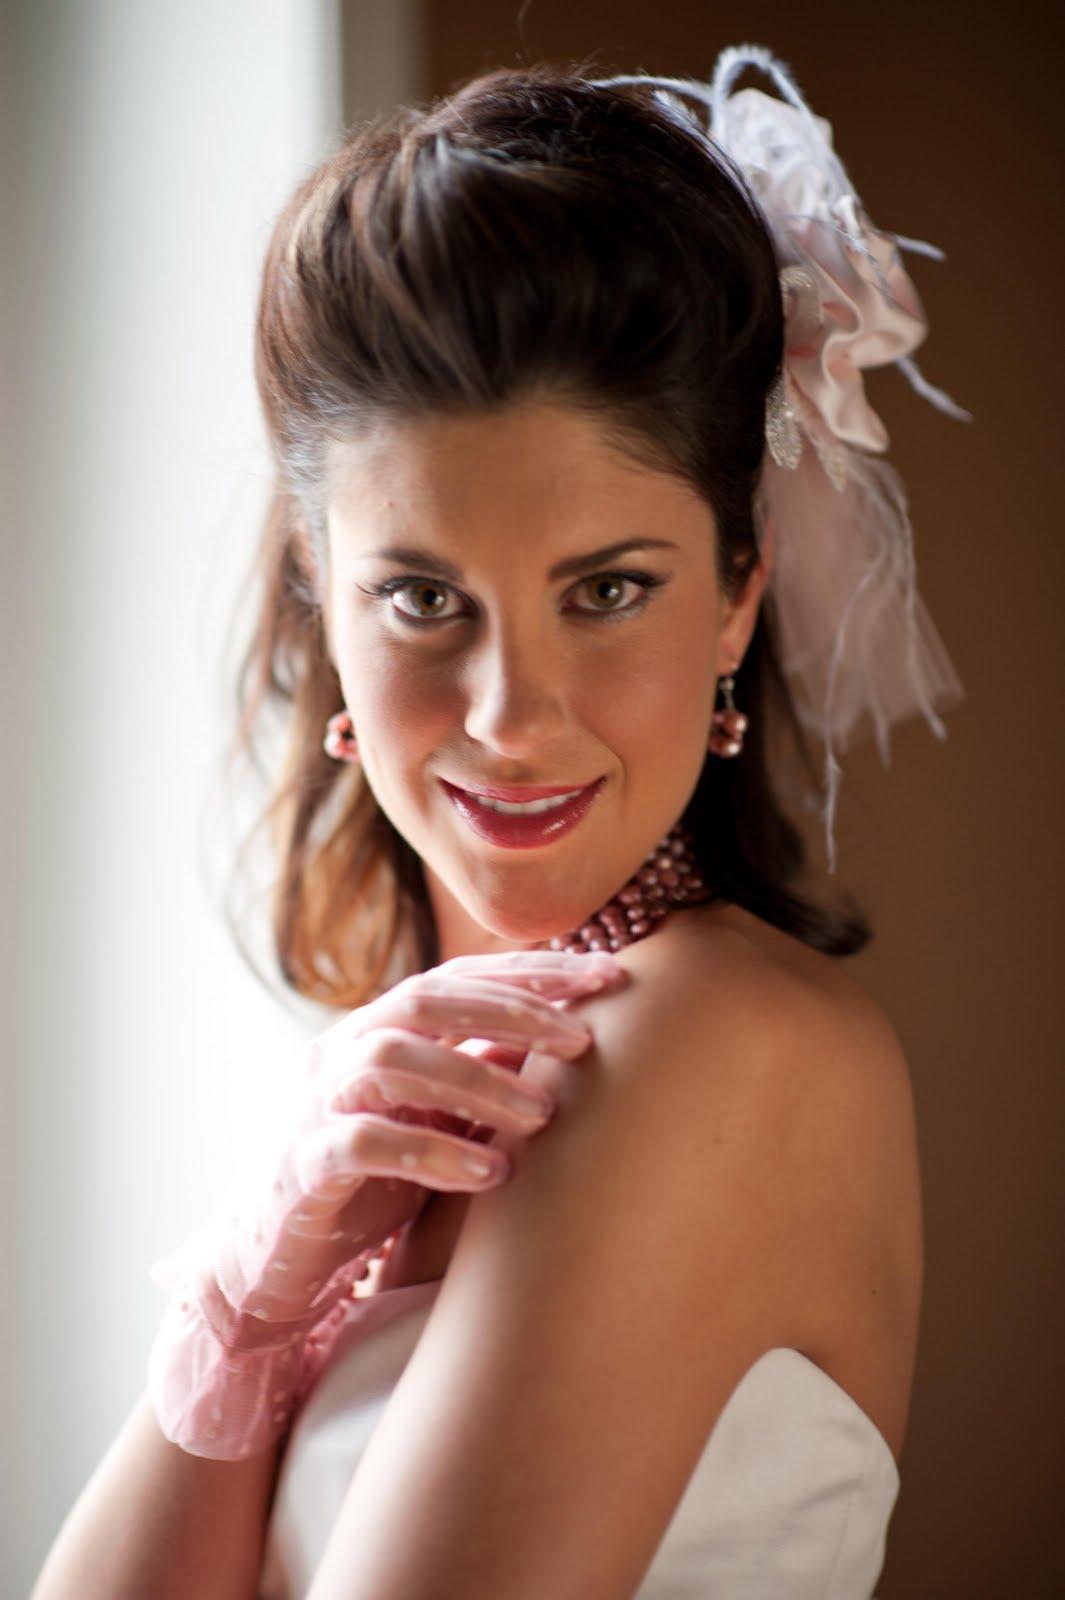 K Schell Designs Bridal Fashion Shoot With Love N Joy